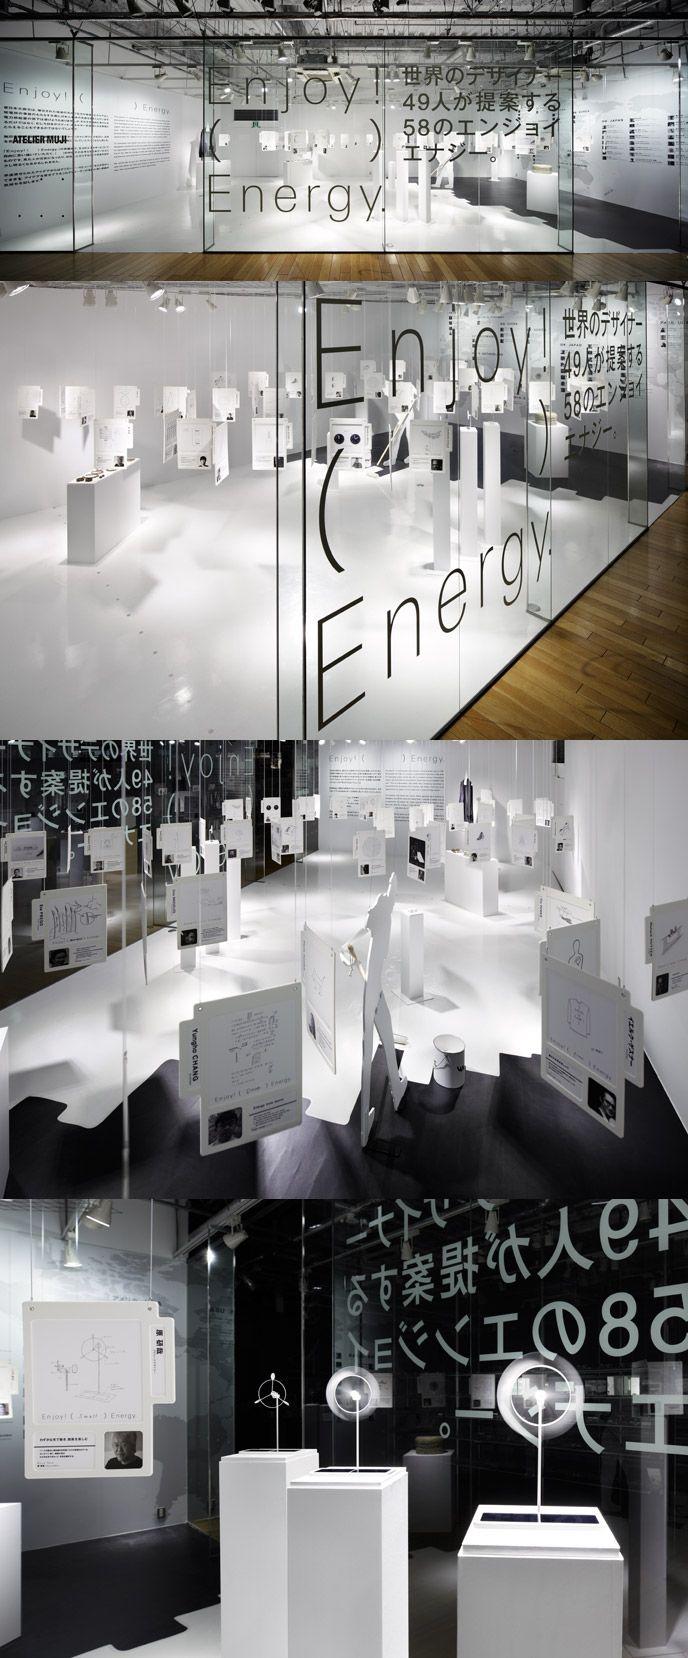 Exhibition Stand Design Kenya : 無印良品 enjoy! energy. kenya hara exhibition museum